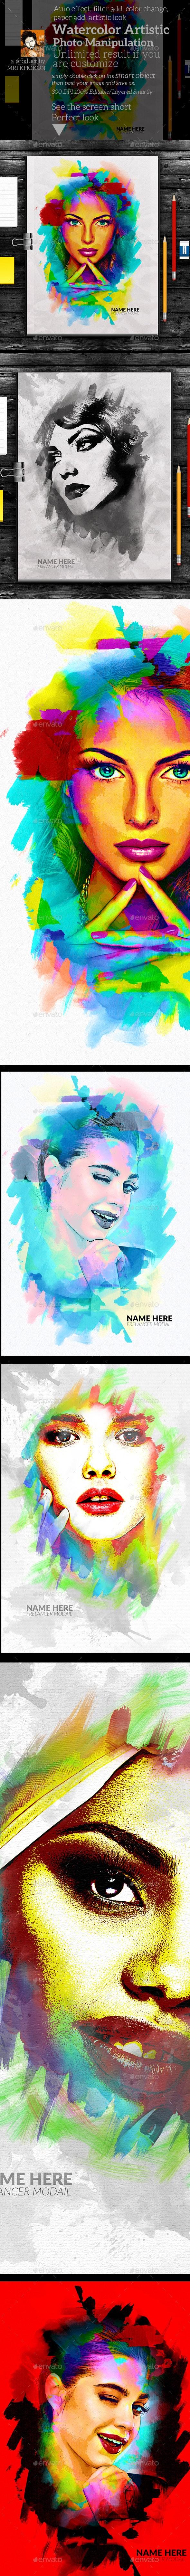 Watercolor Artistic Photo Manipulation - Artistic Photo Templates